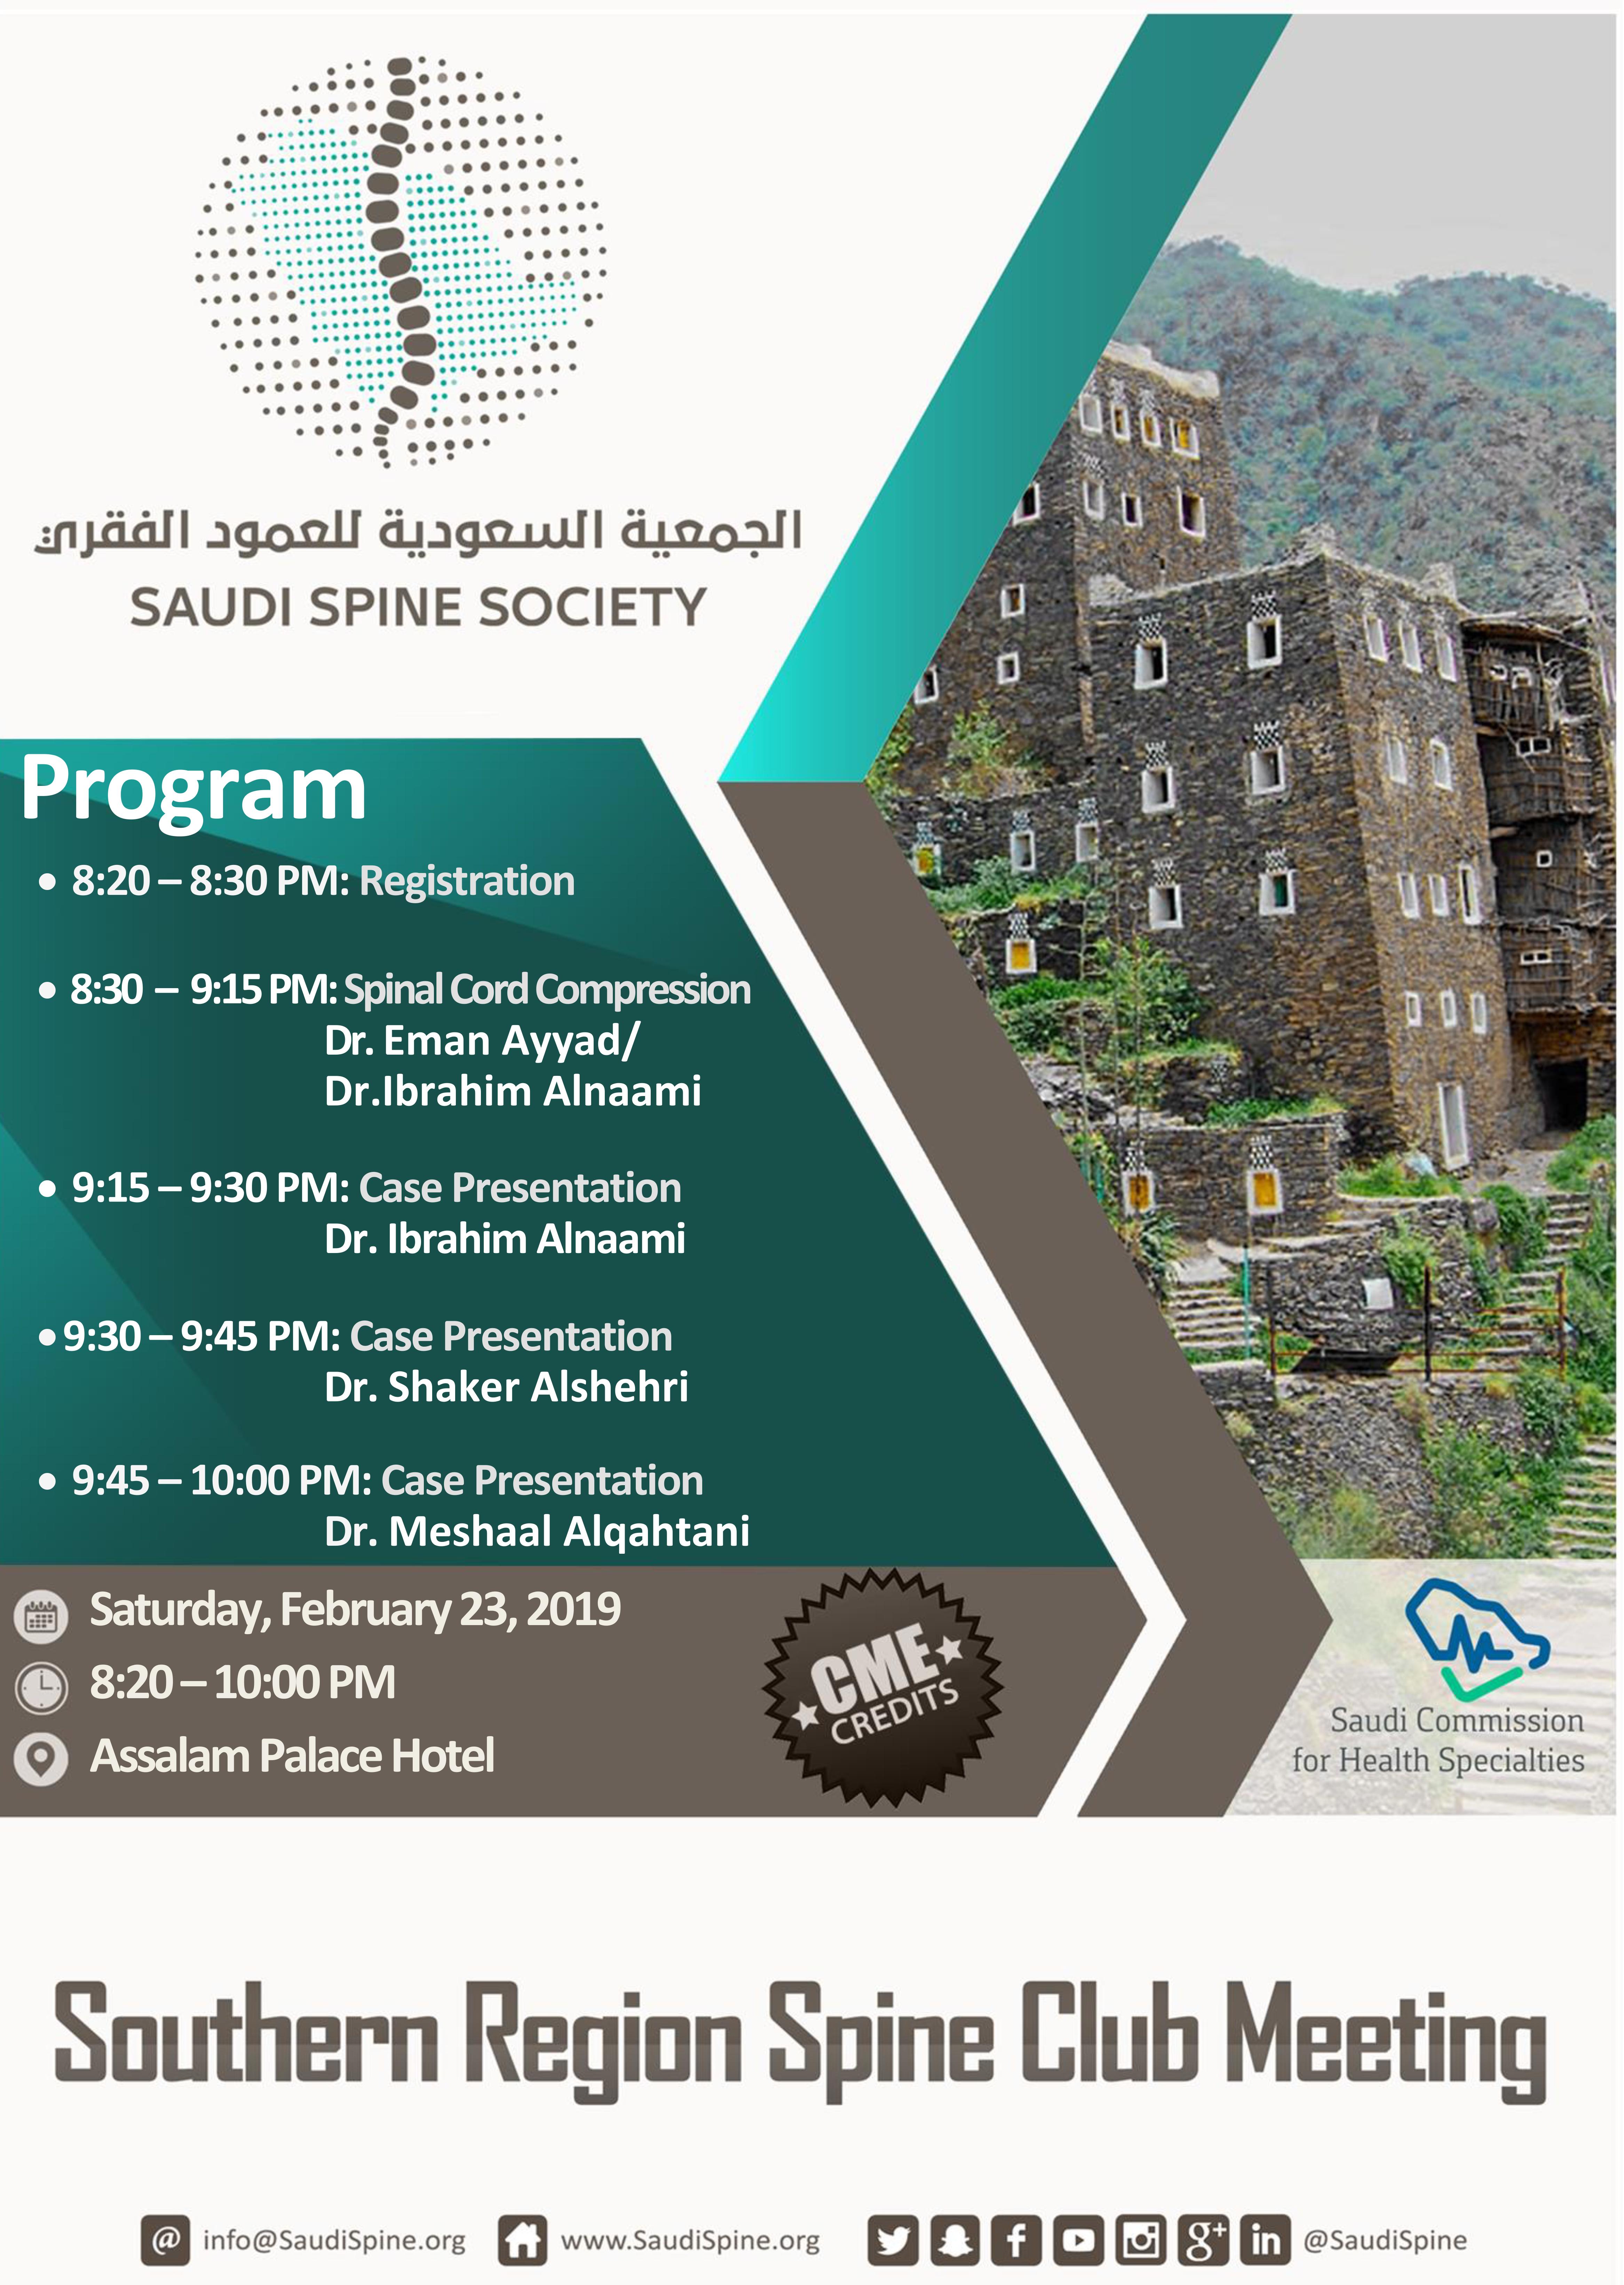 4th Southern Region Spine Club Meeting